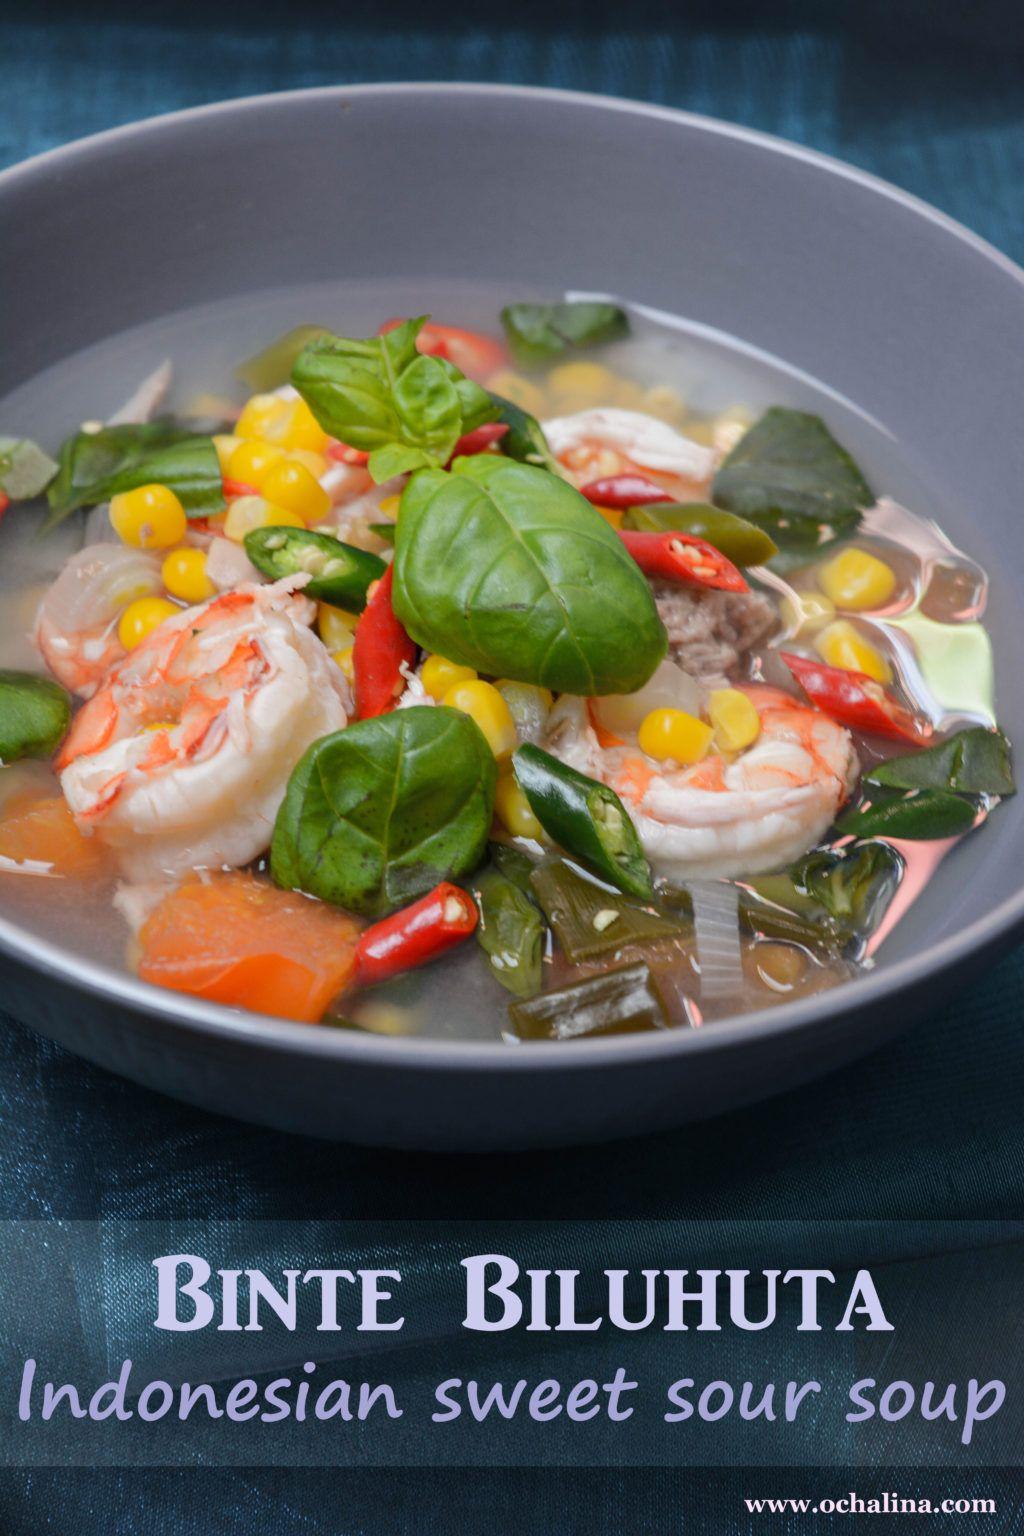 Binte Biluhuta, sweet and sour Indonesian corn soup – Ochalina